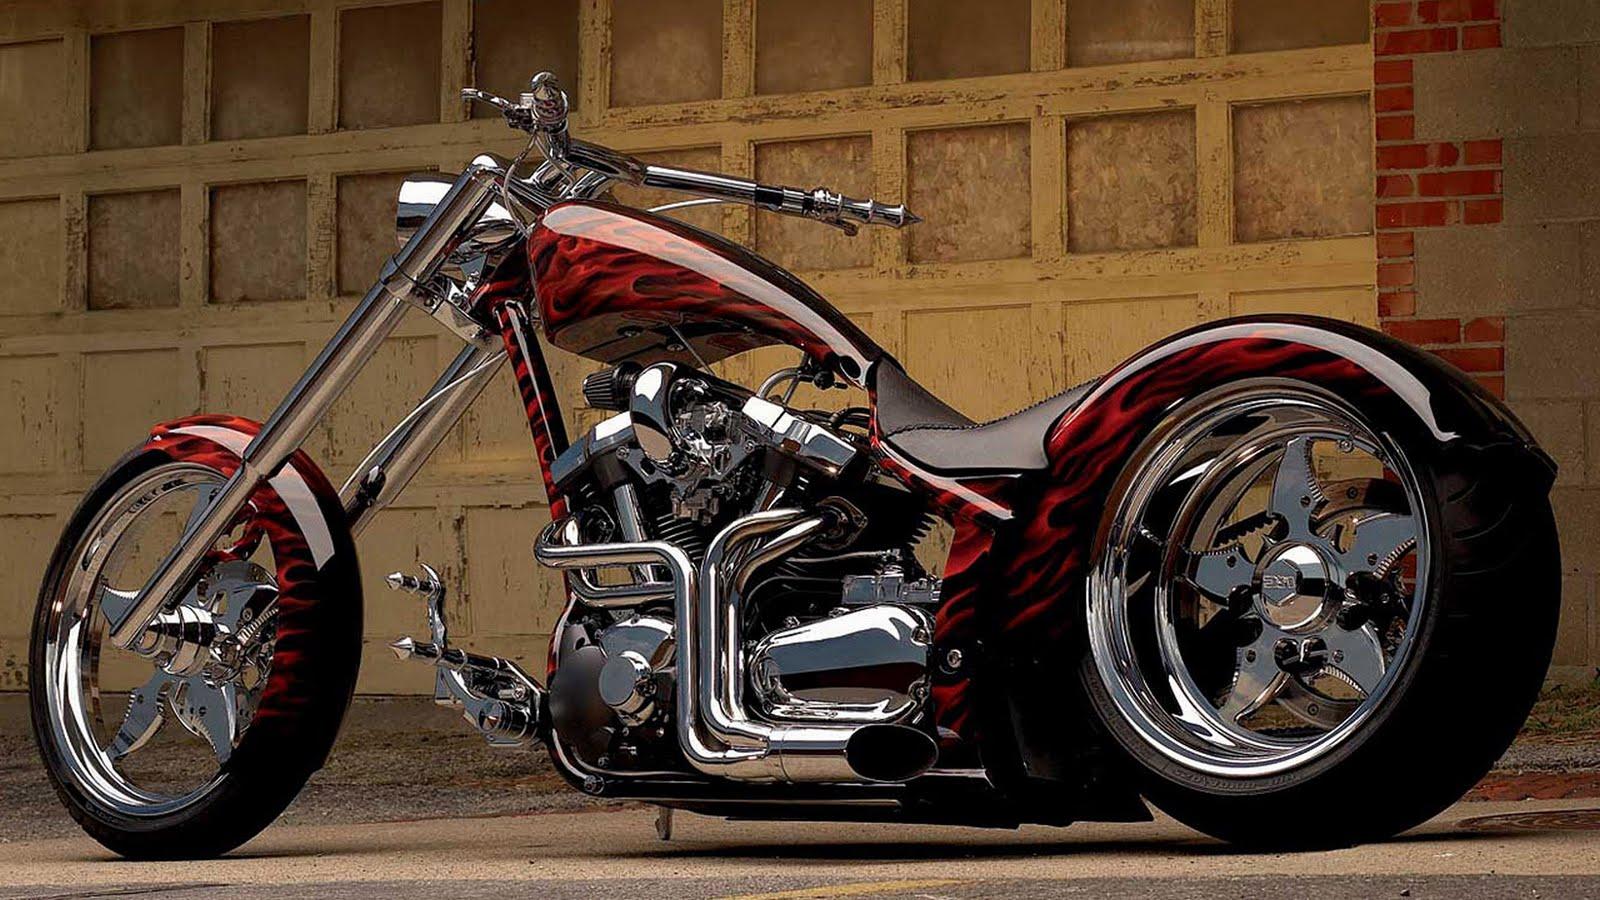 dirk bike hd wallpaper 1080p - photo #20